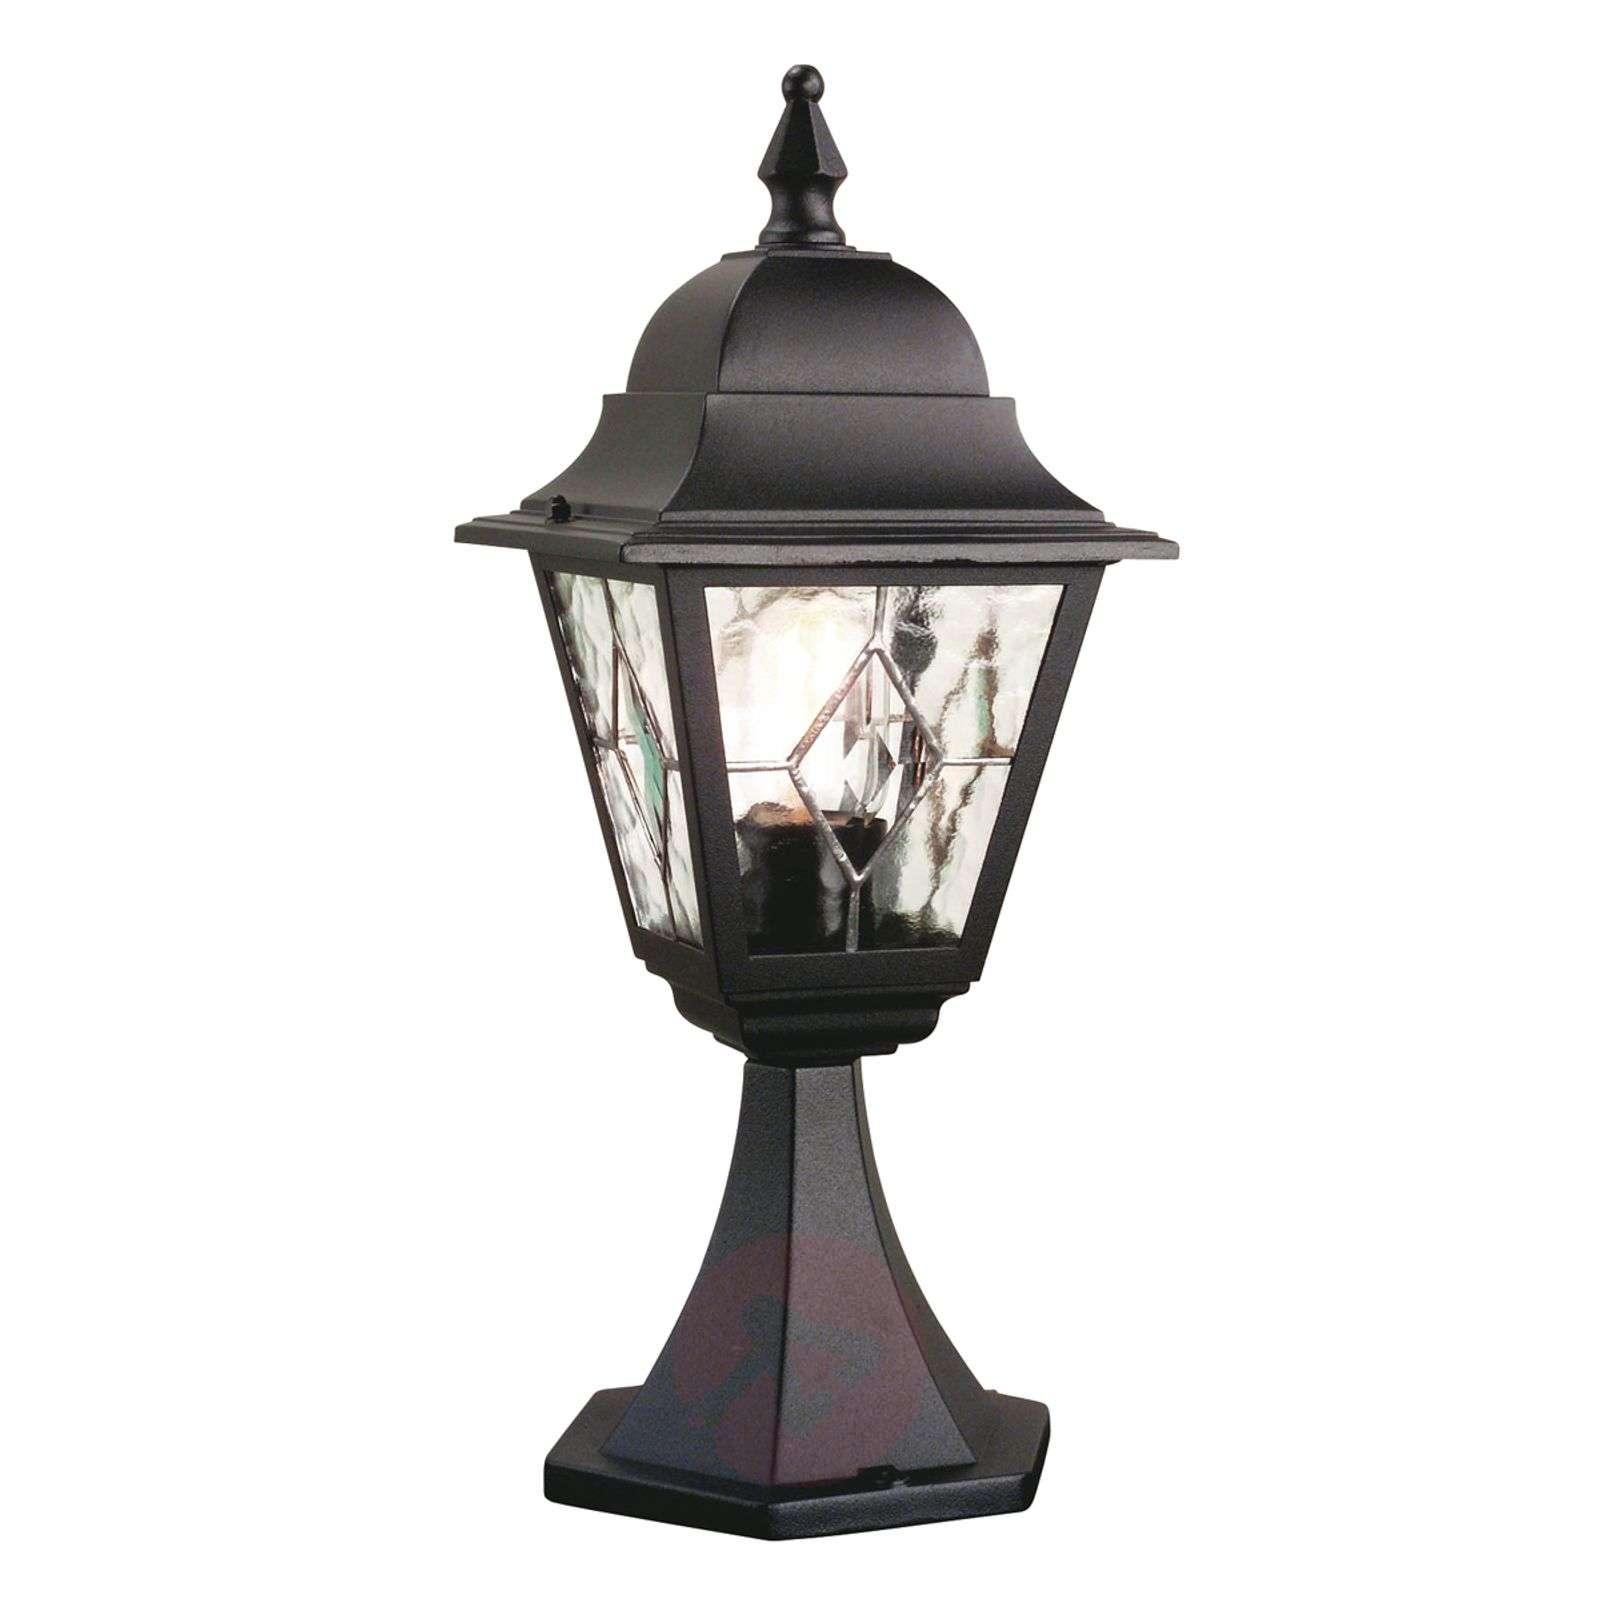 Lead glazed pillar light Norfolk-3048425-01